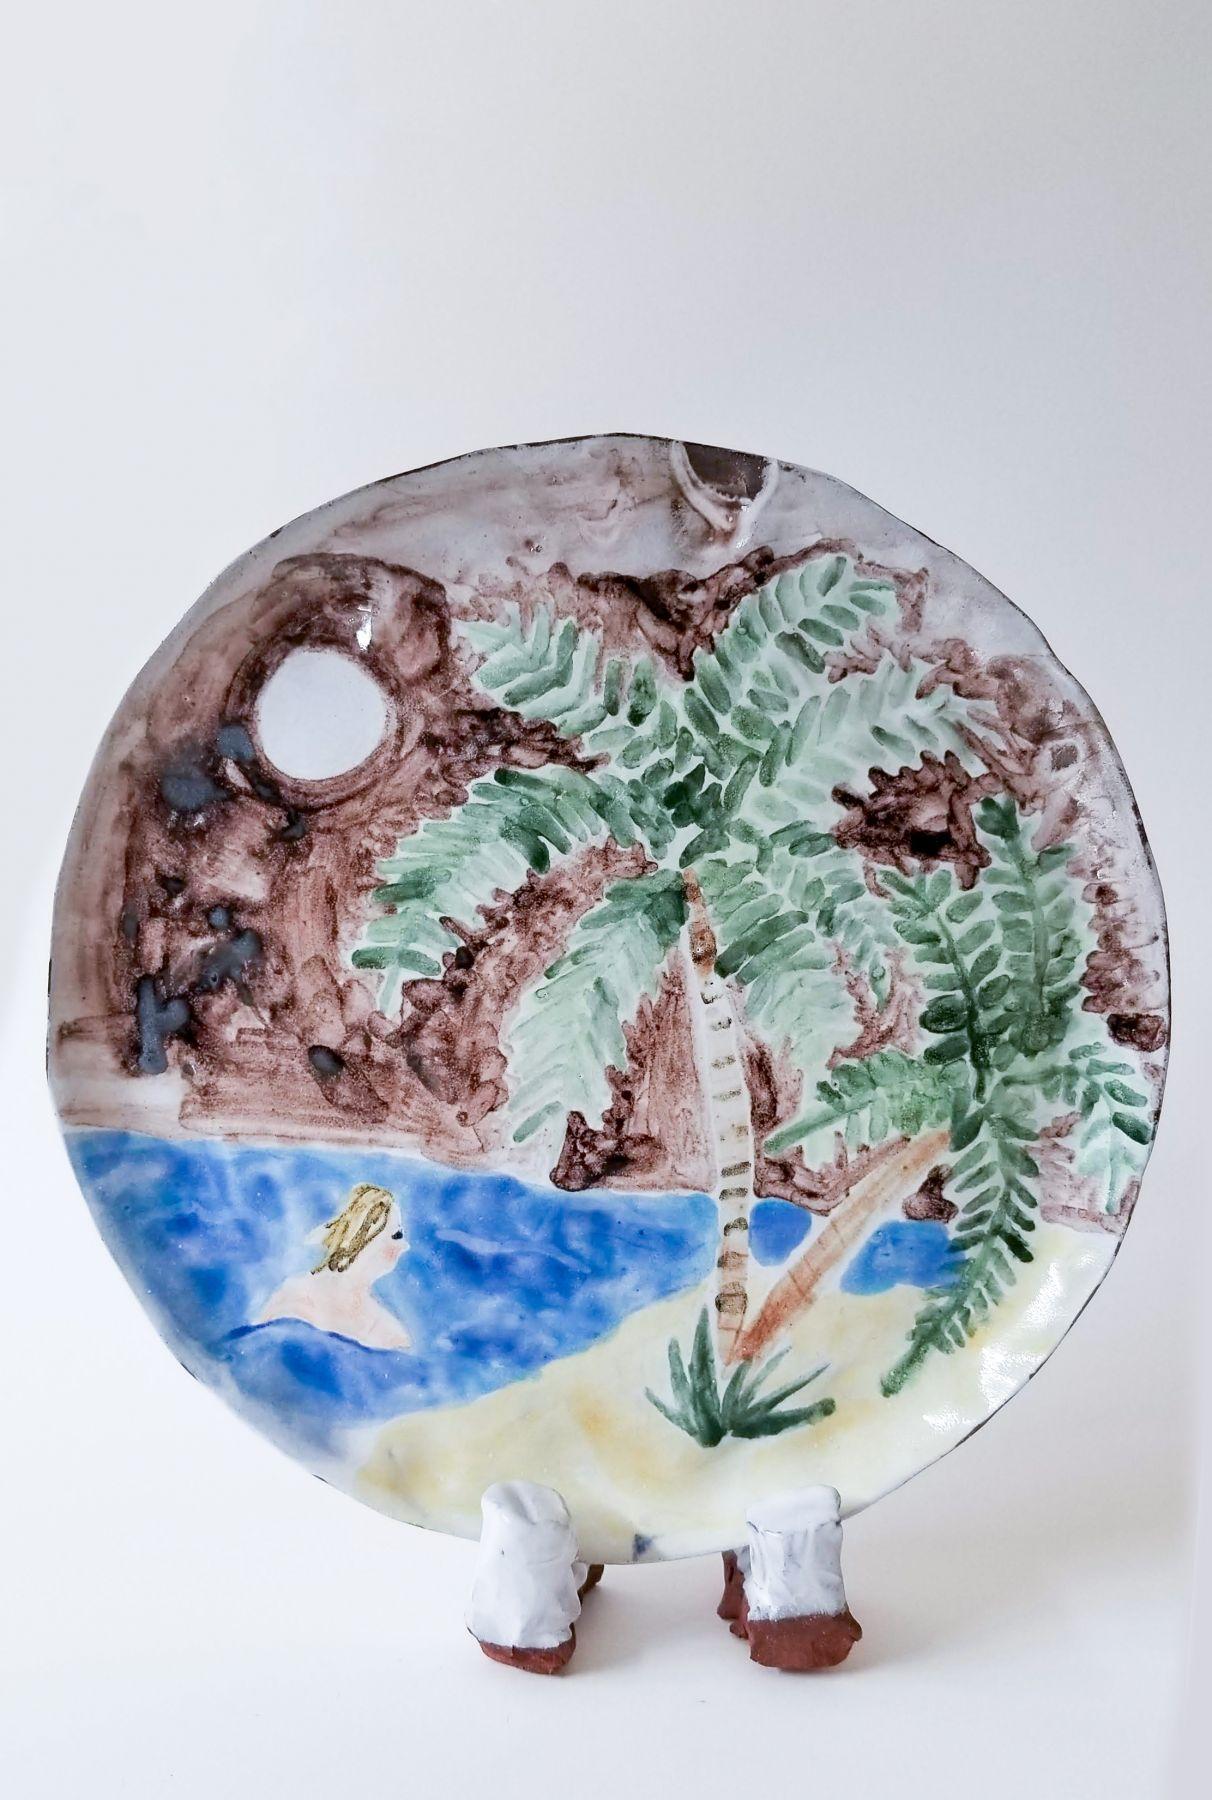 Jessica Perelman, Endless Exit, 2018